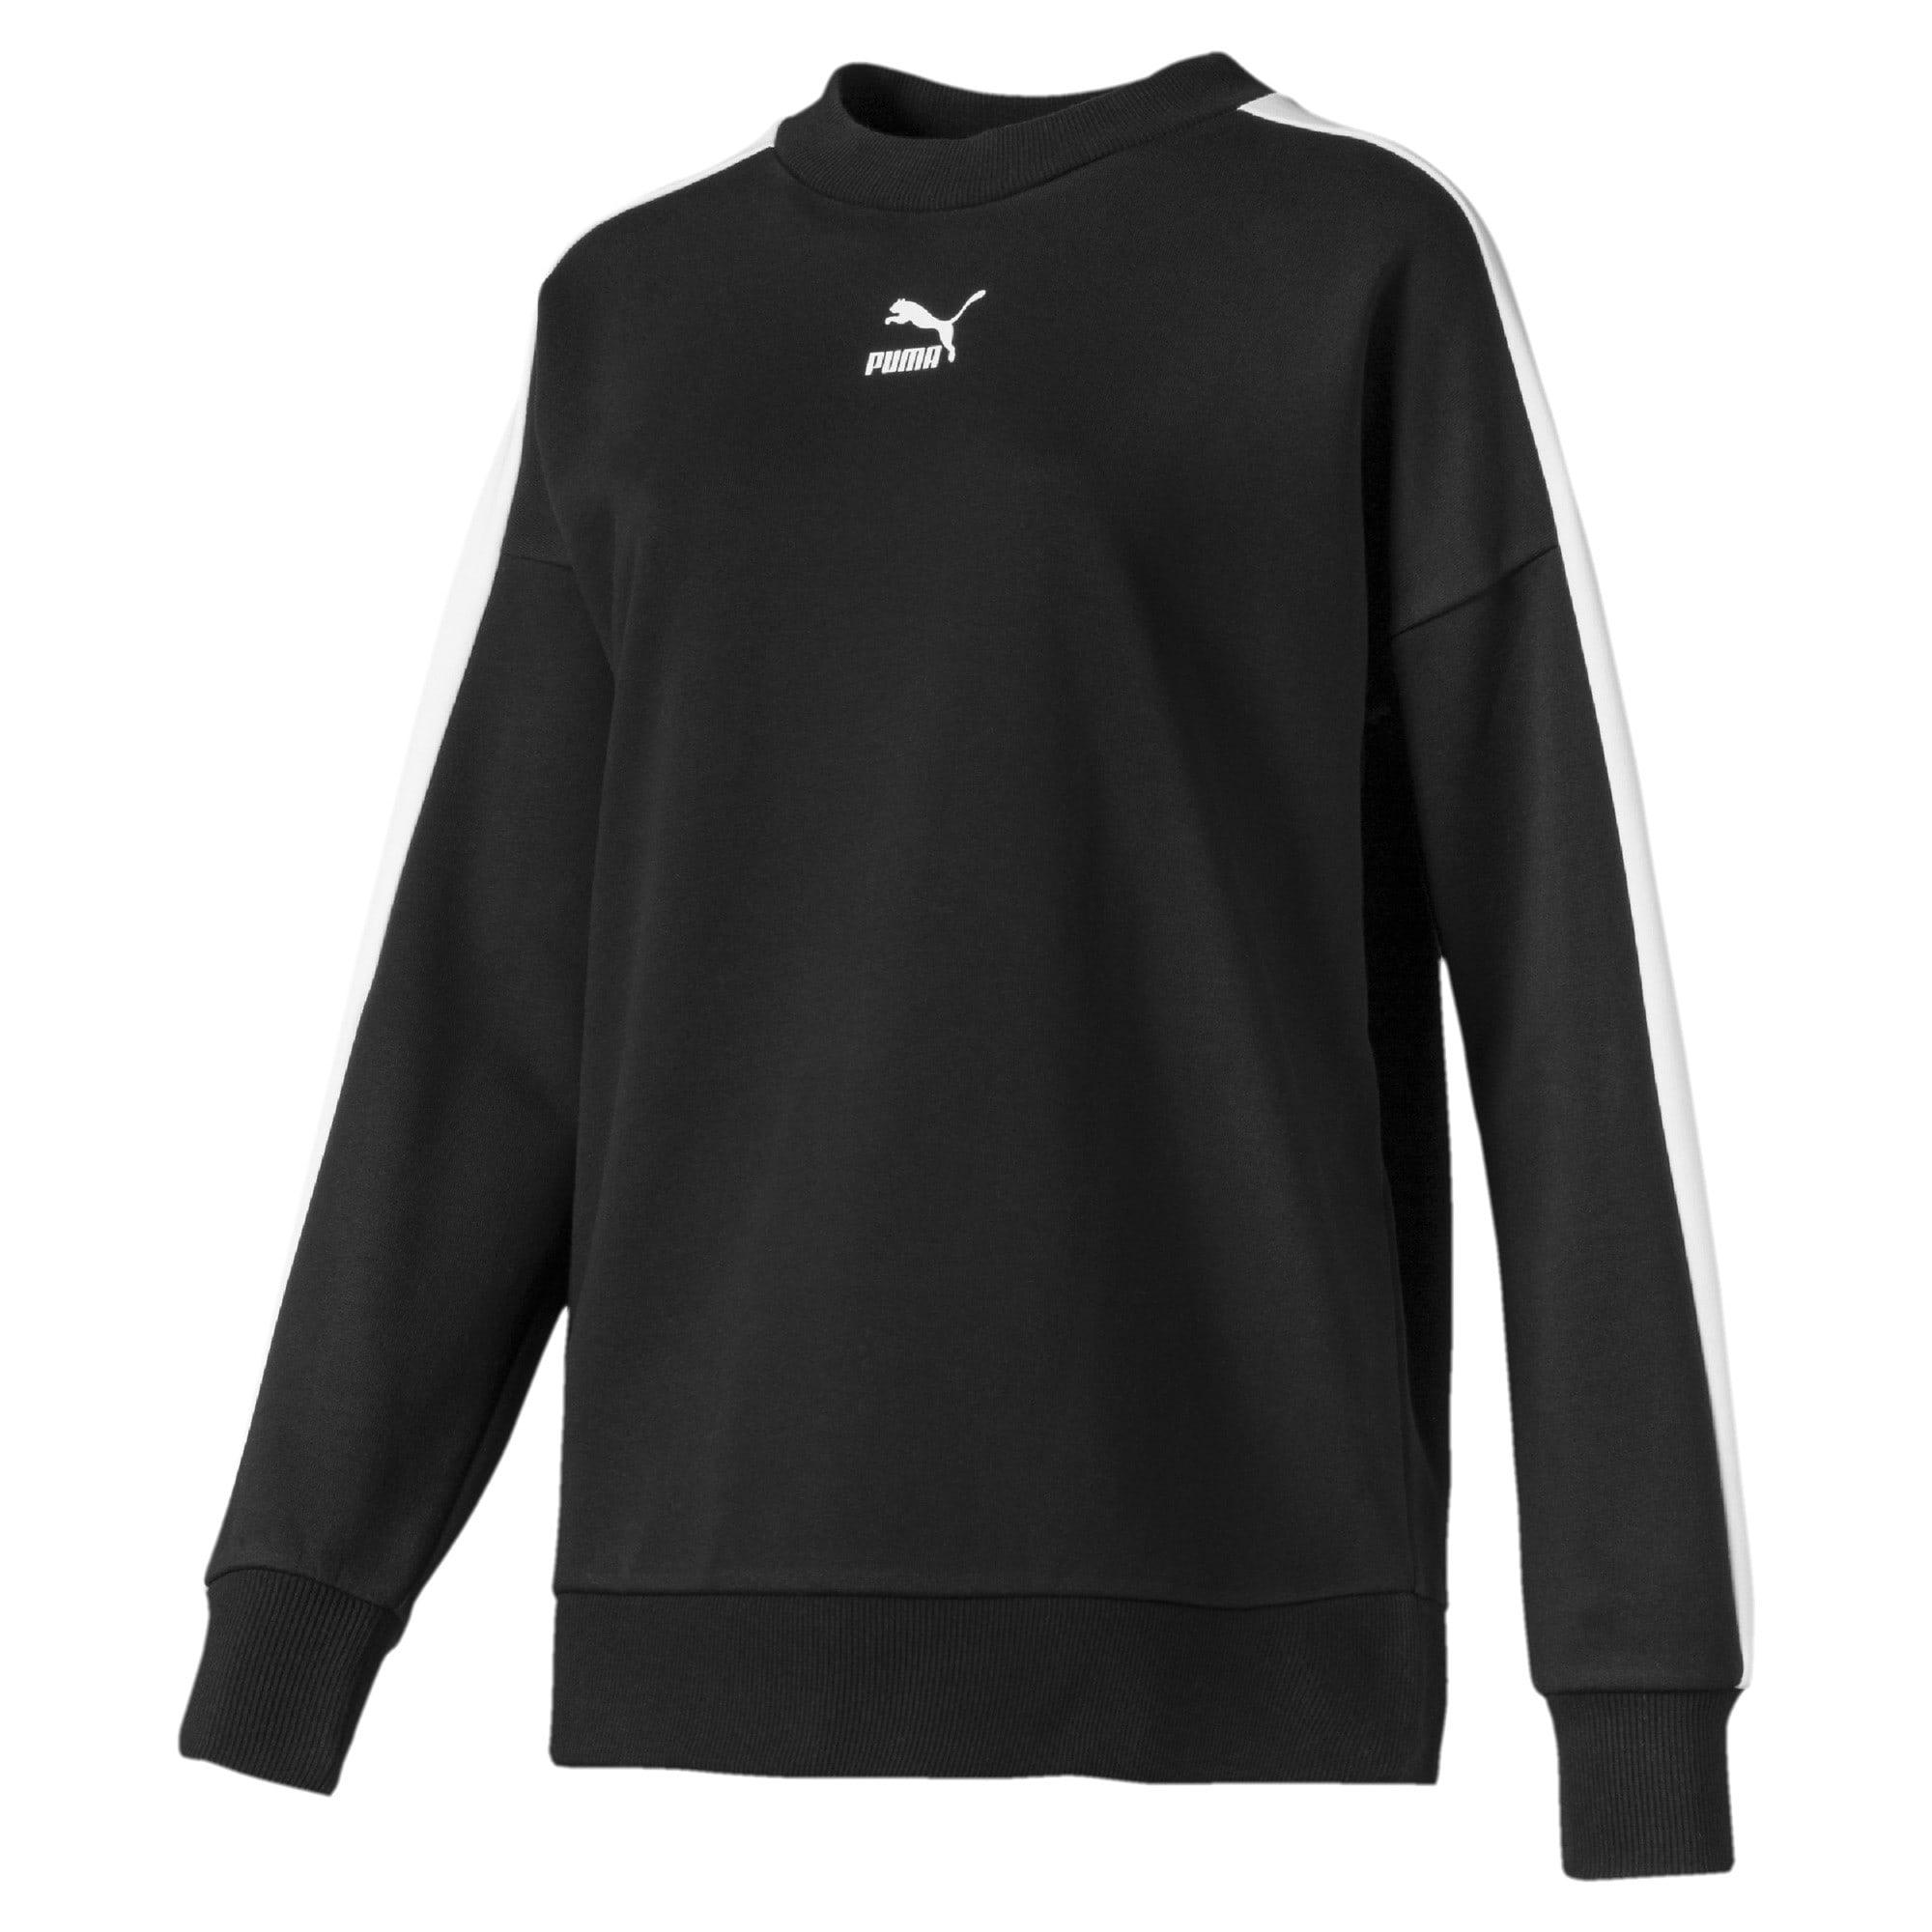 Thumbnail 1 of Classics T7 Women's Crewneck Sweatshirt, Puma Black, medium